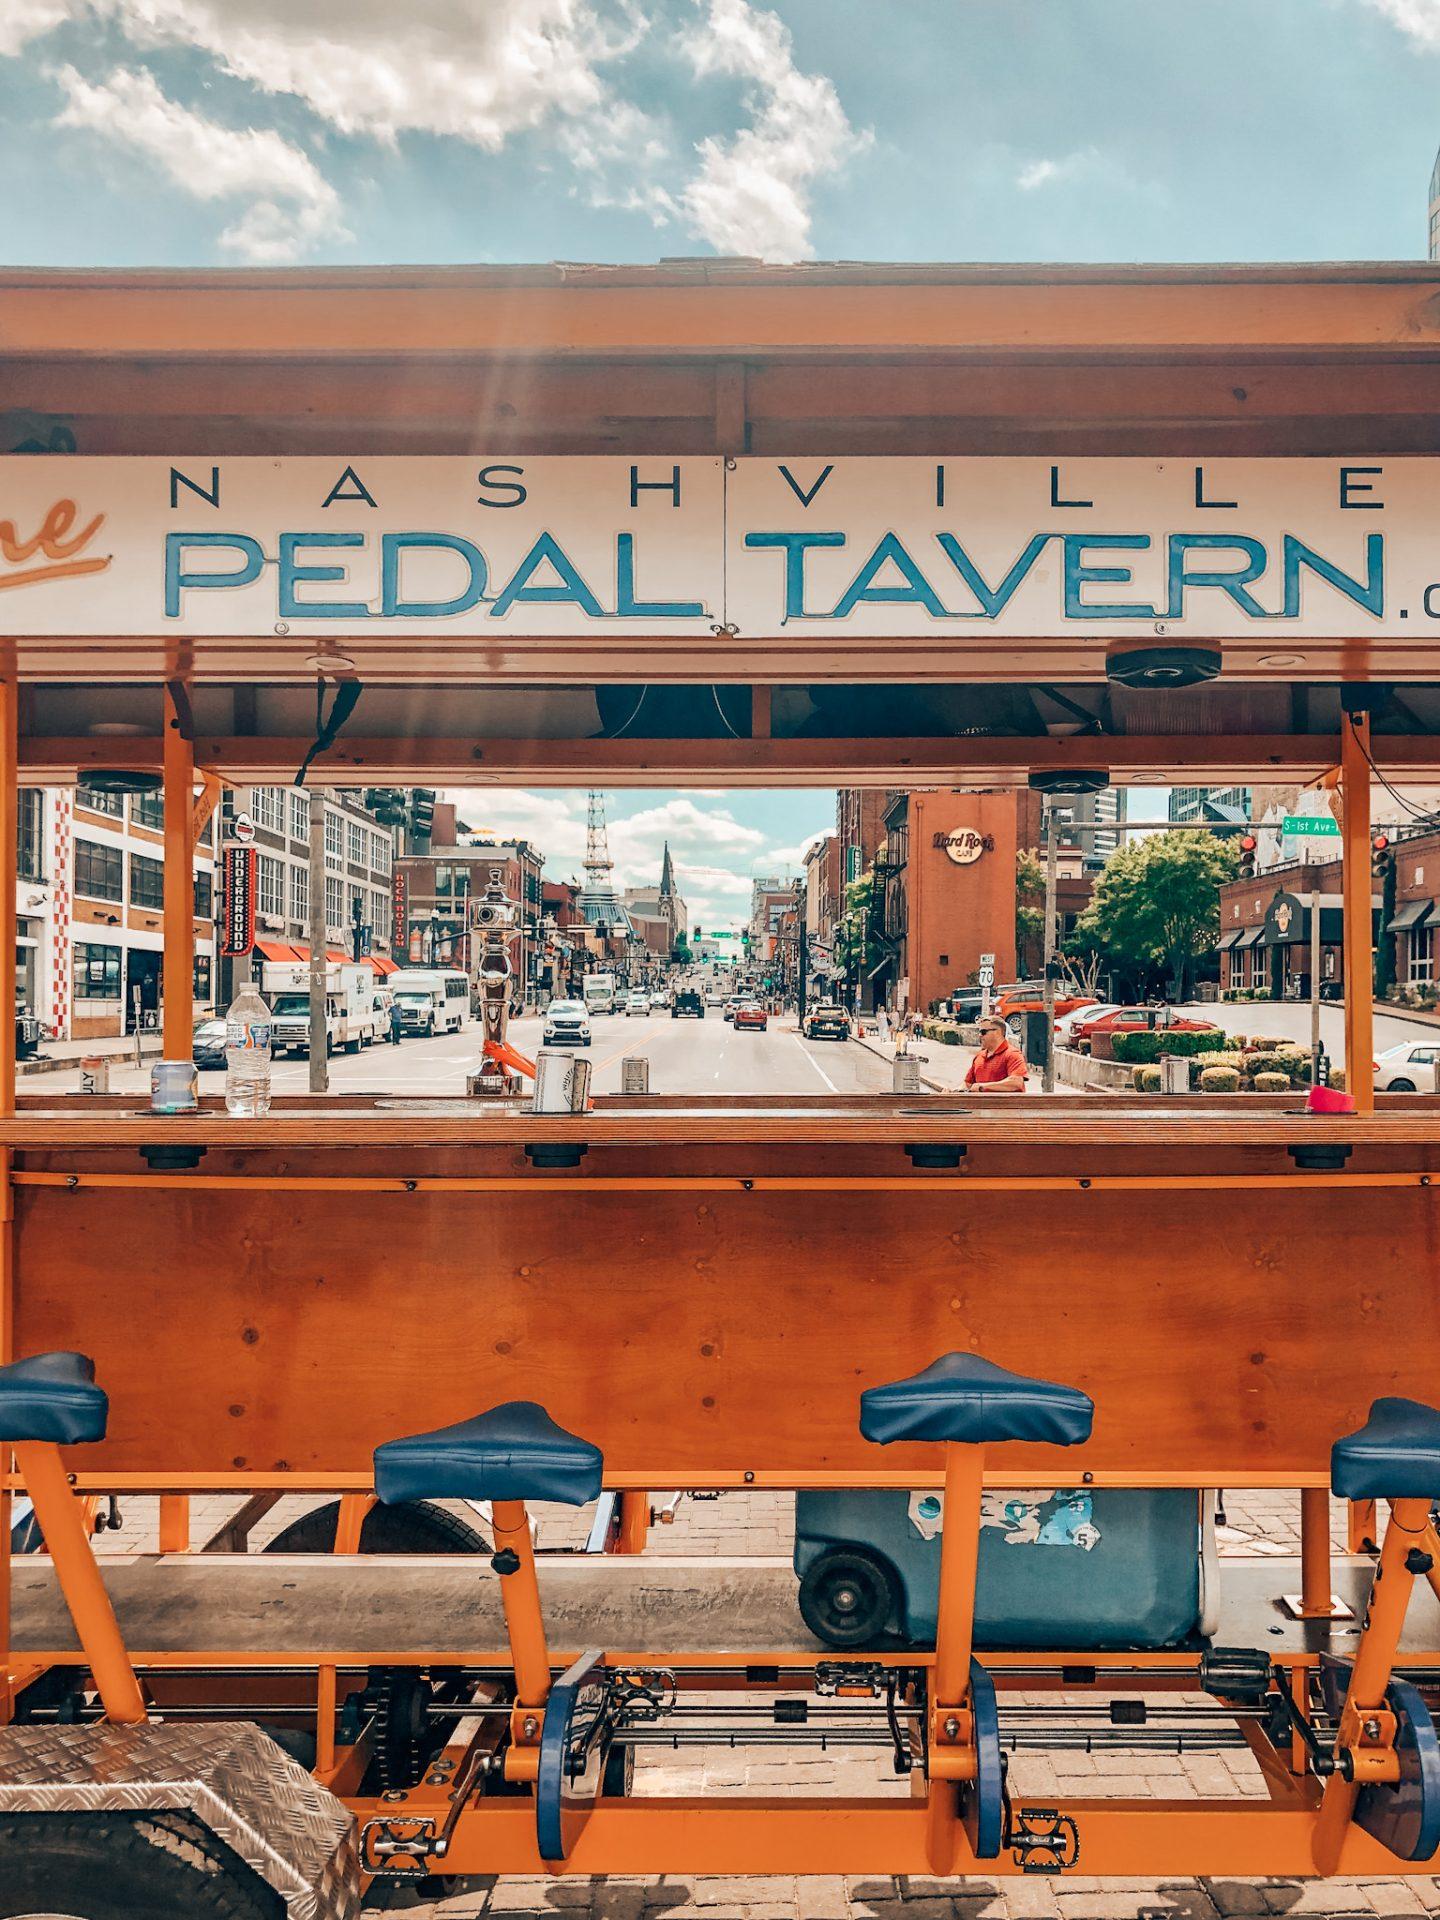 Pedal Tavern on Broadway in Nashville